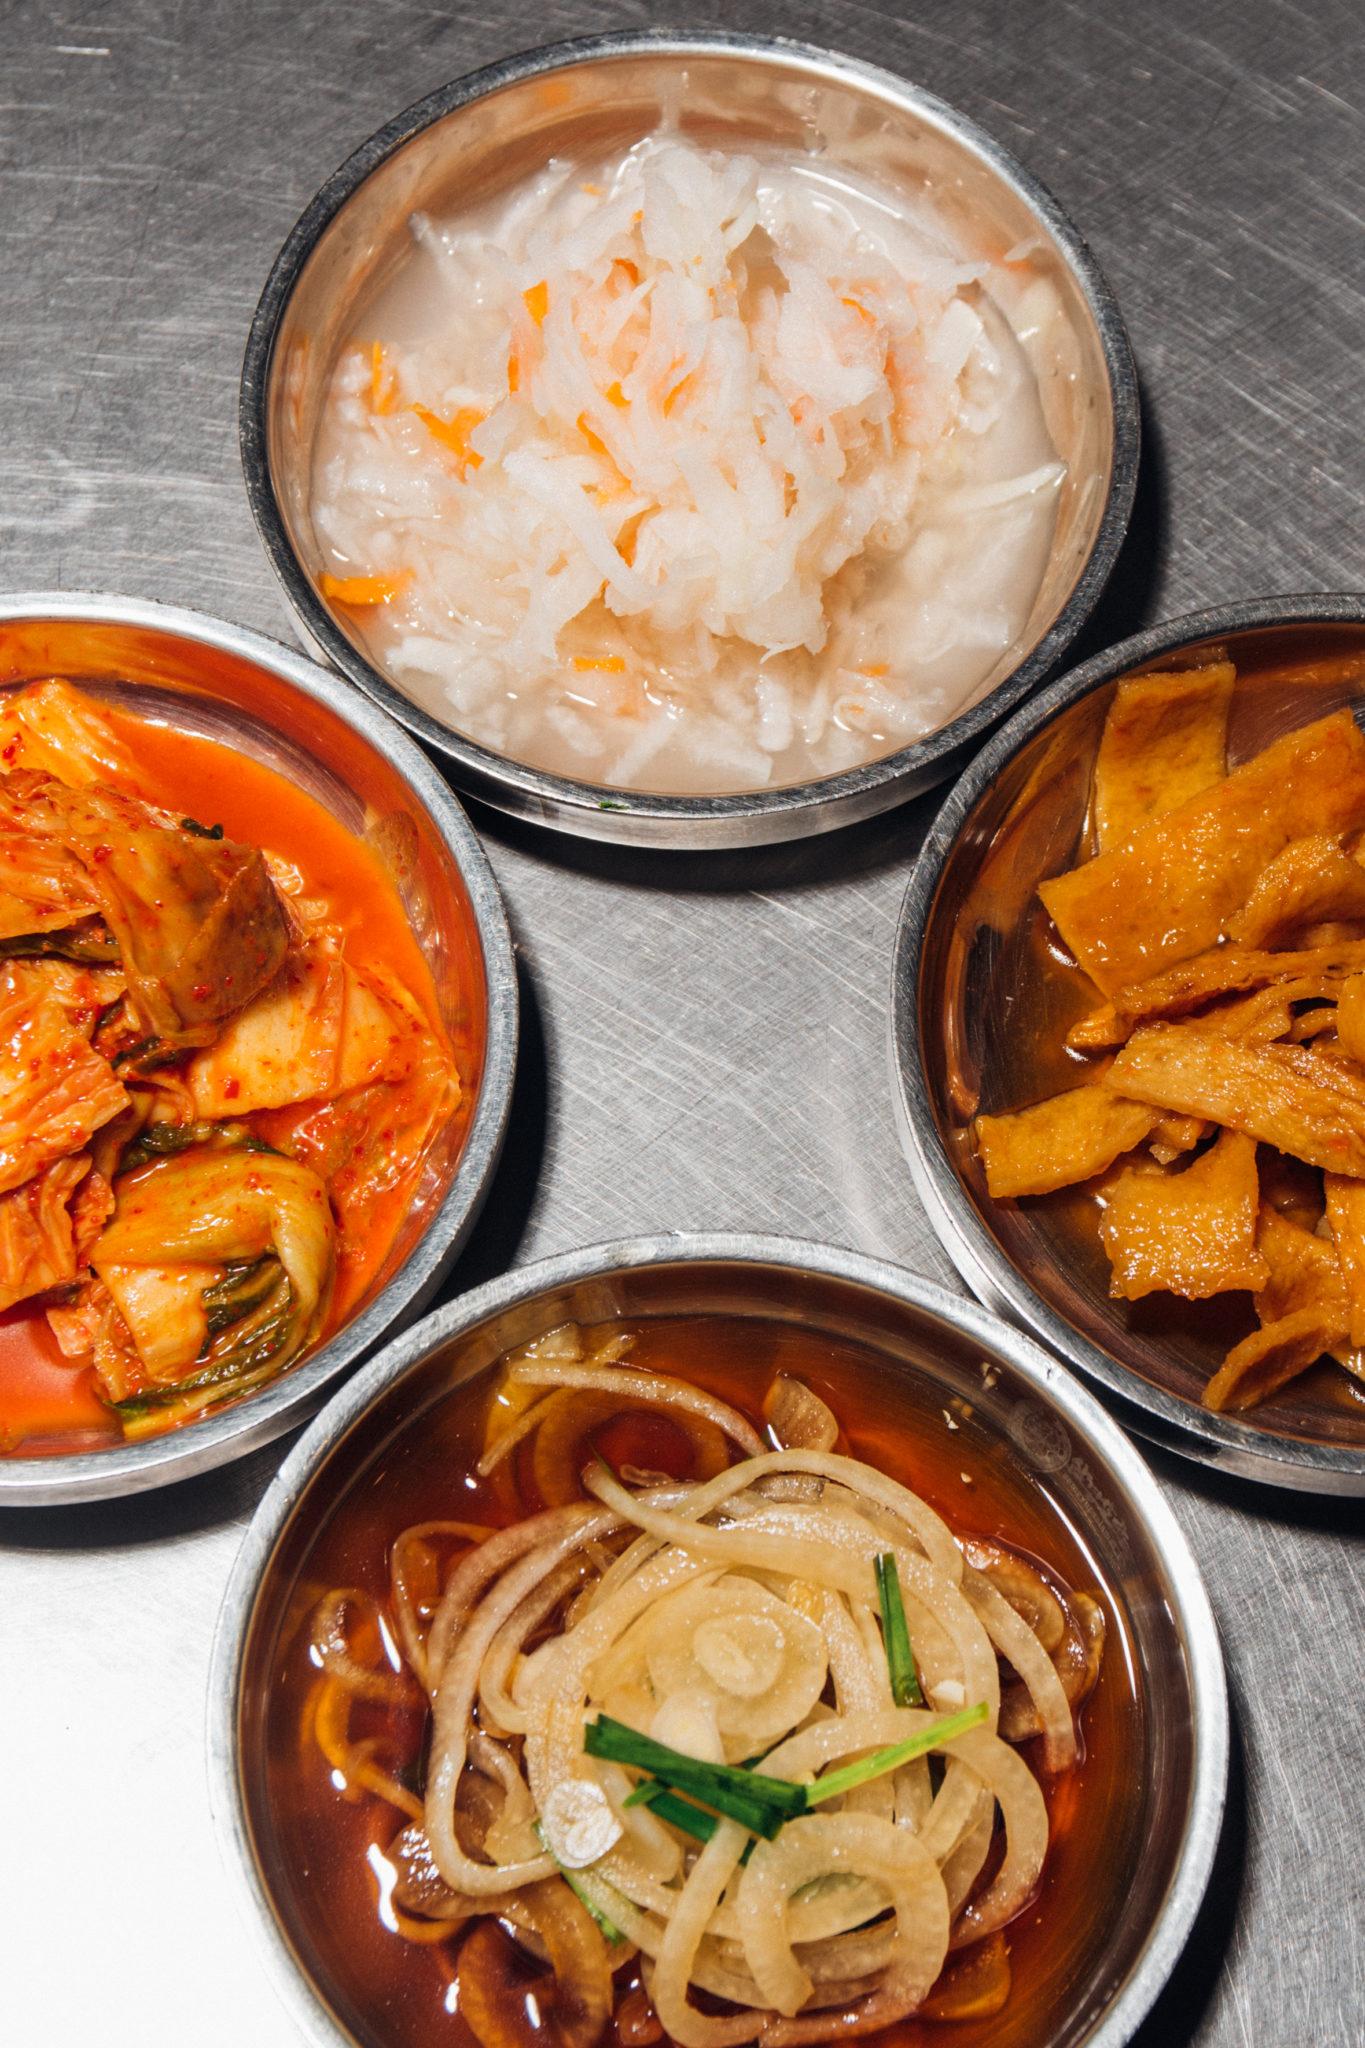 Banchan (clockwise from top): radish, tofu, onions, kimchi